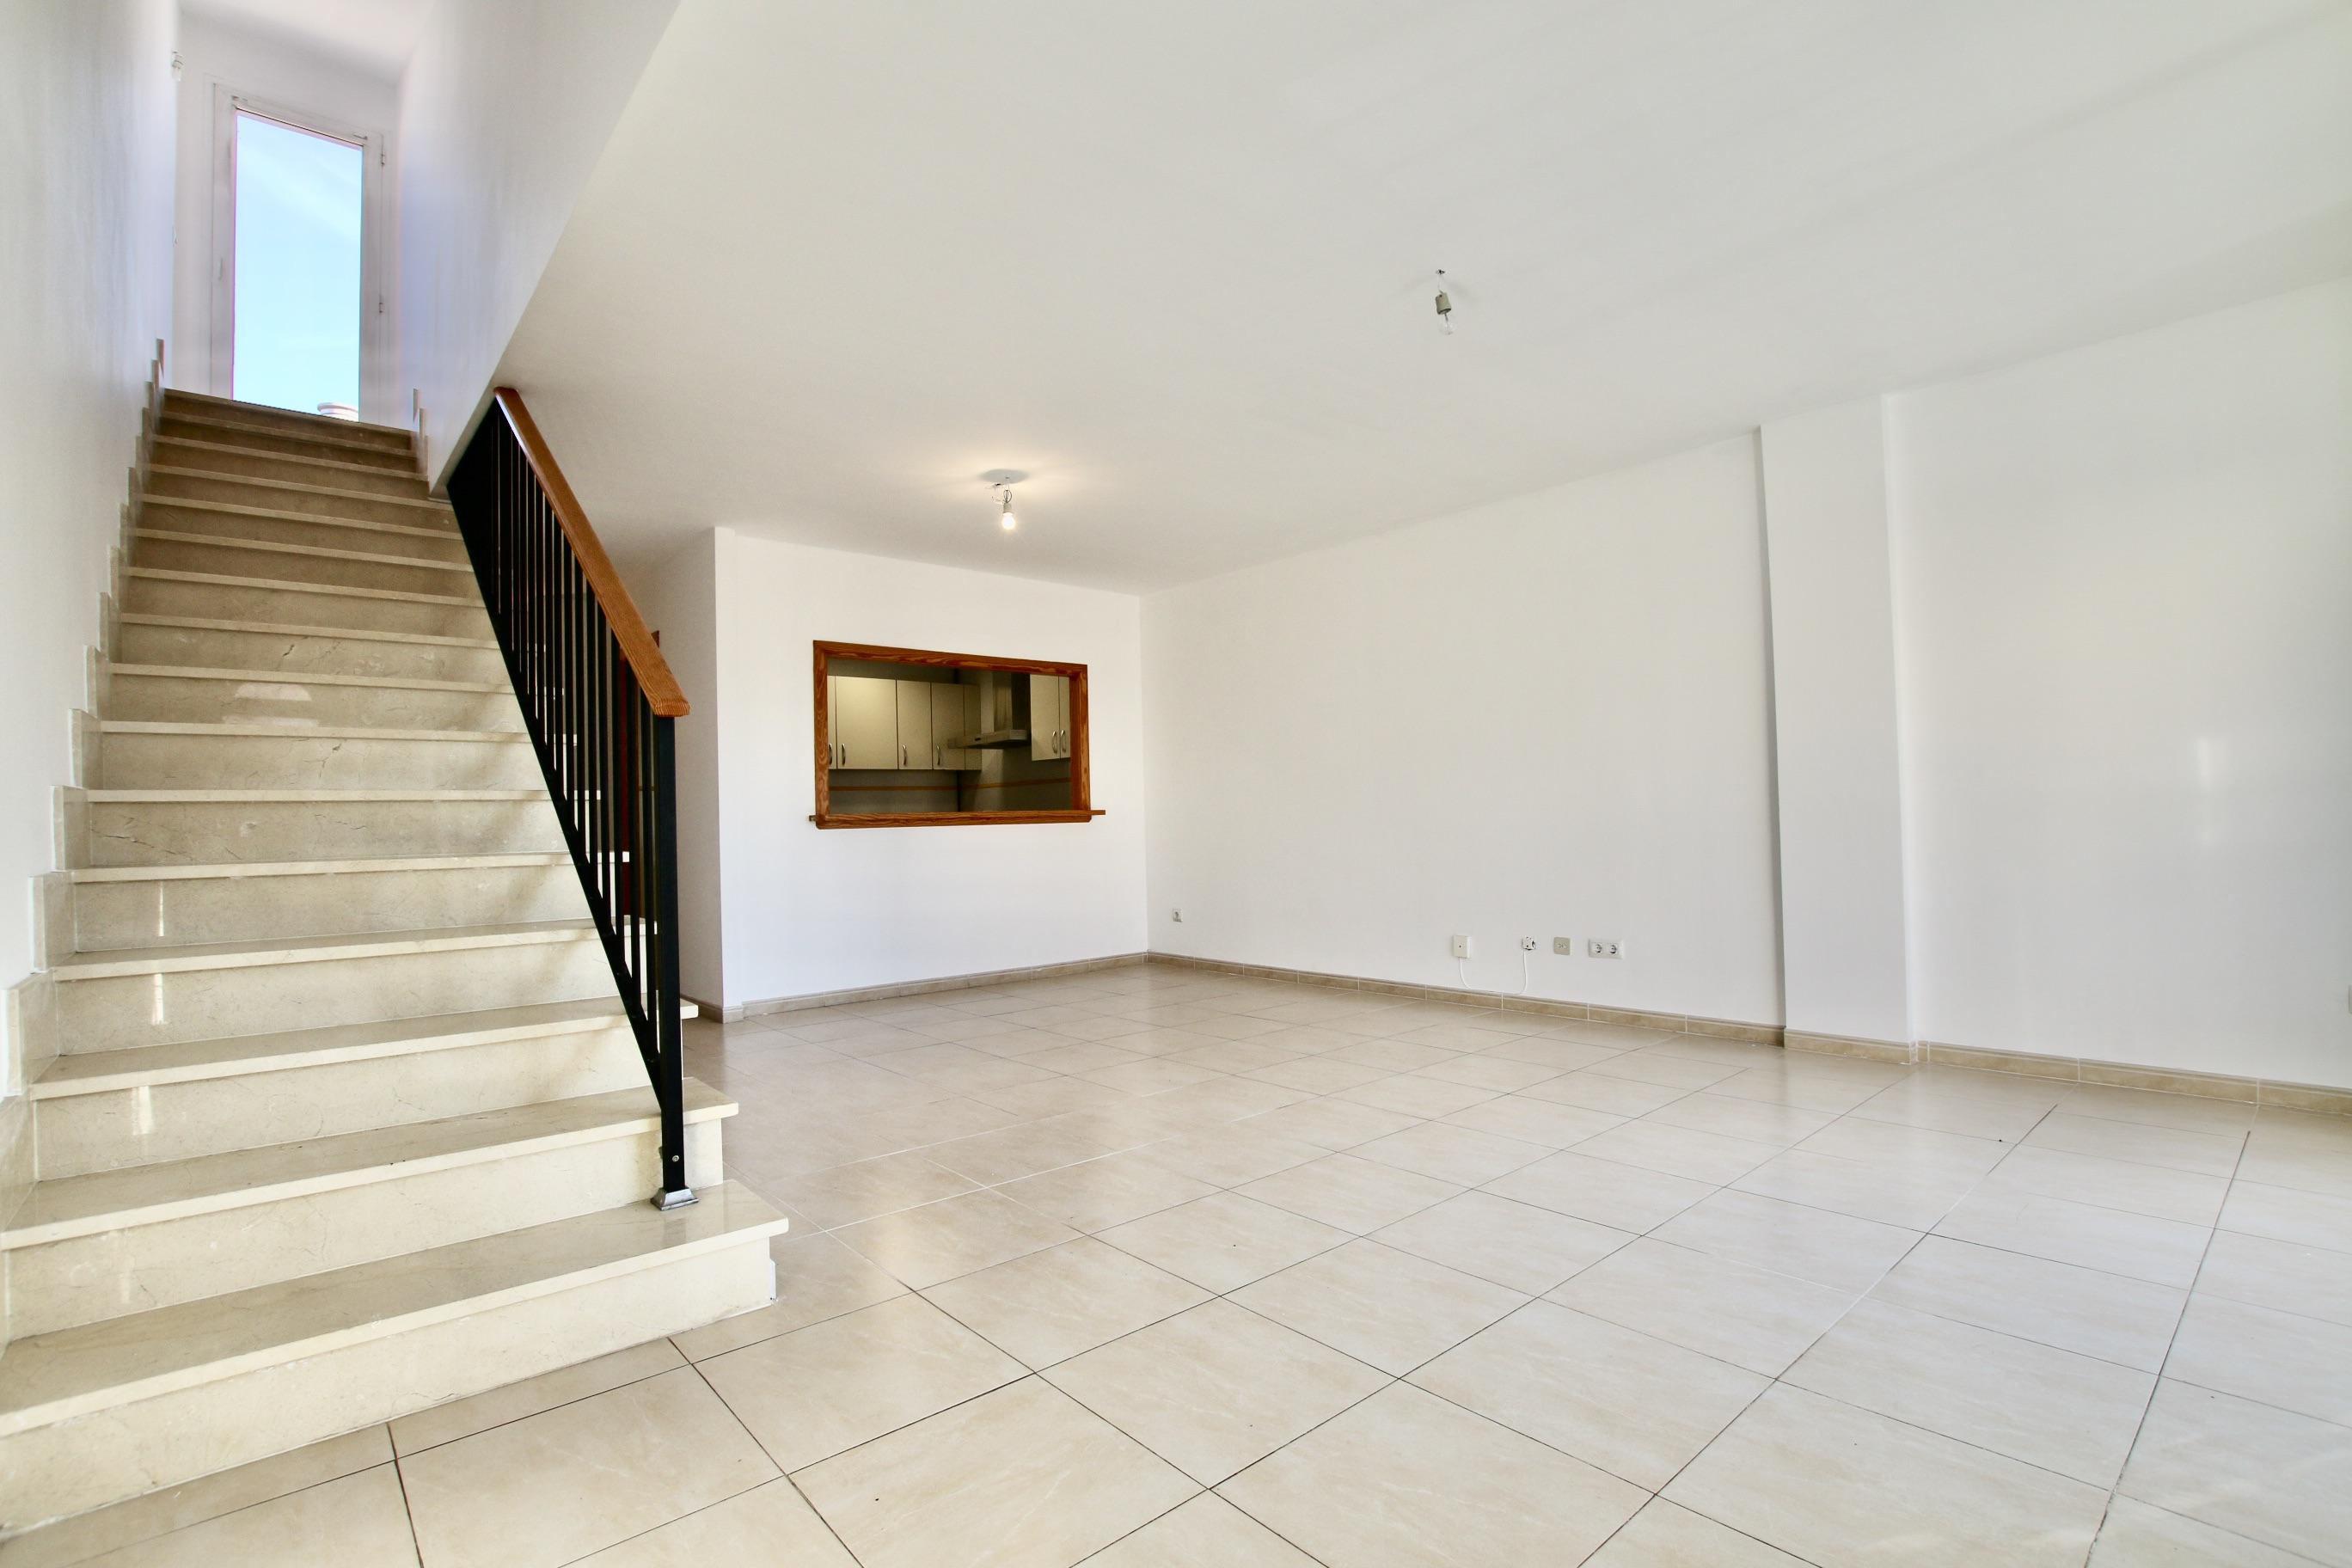 Cozy 2 bedroom apartment with amazing terrace in Coll d'en Rabassa @ Palma de Mallorca